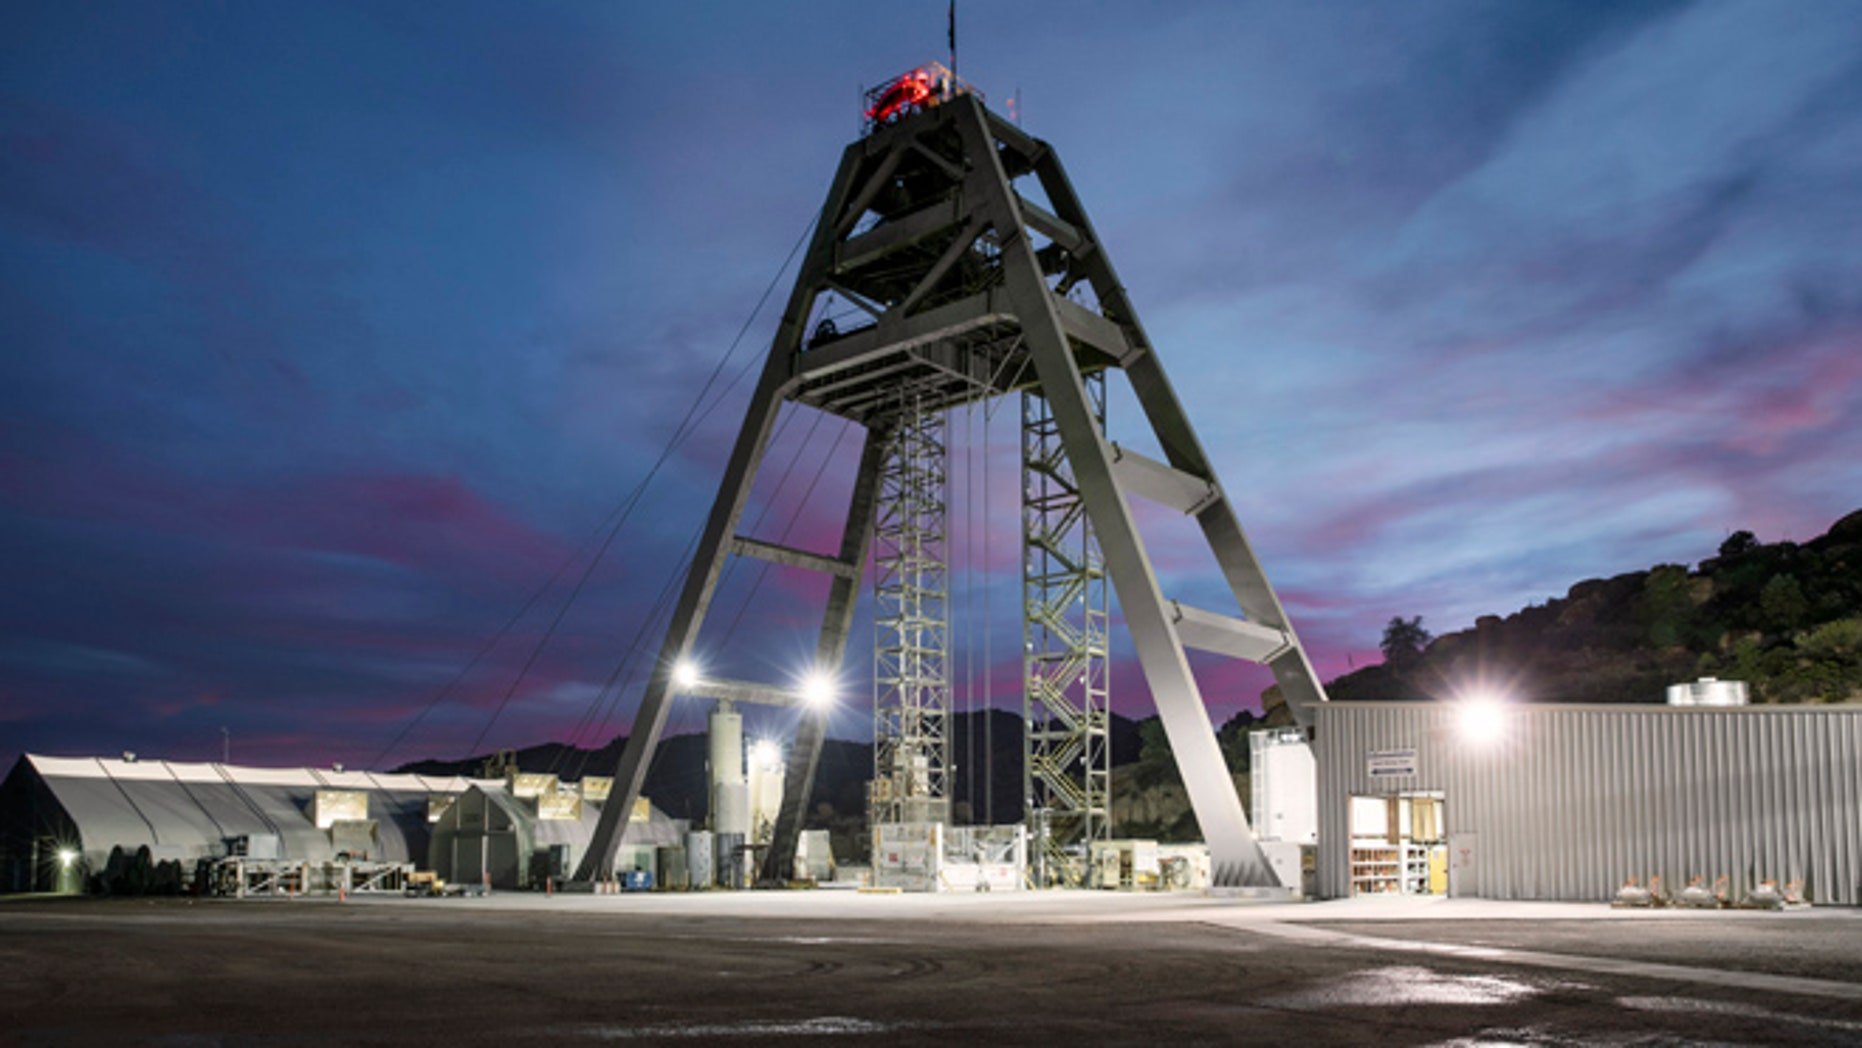 The No. 10 shaft at the Resolution Copper mine near Superior, Arizona. (Photo: Barbara Mannino/FoxNews.com)